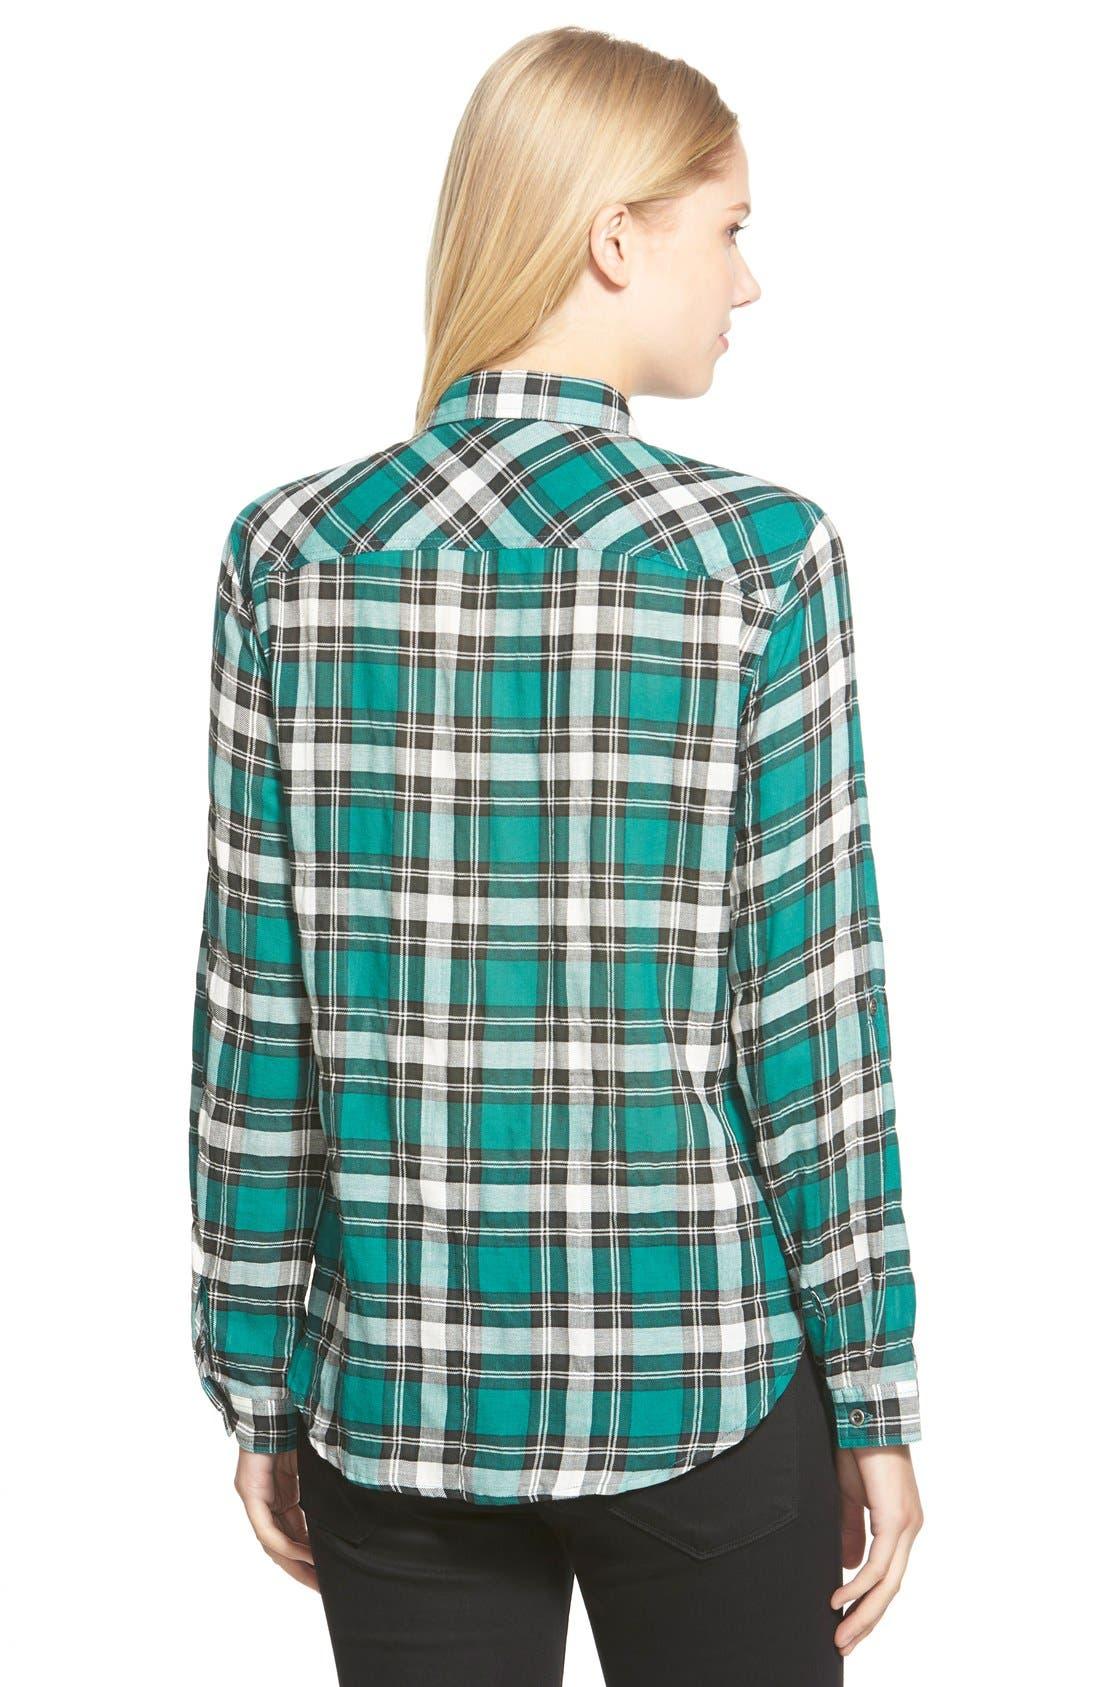 Roll Sleeve Woven Plaid Shirt,                             Alternate thumbnail 4, color,                             300